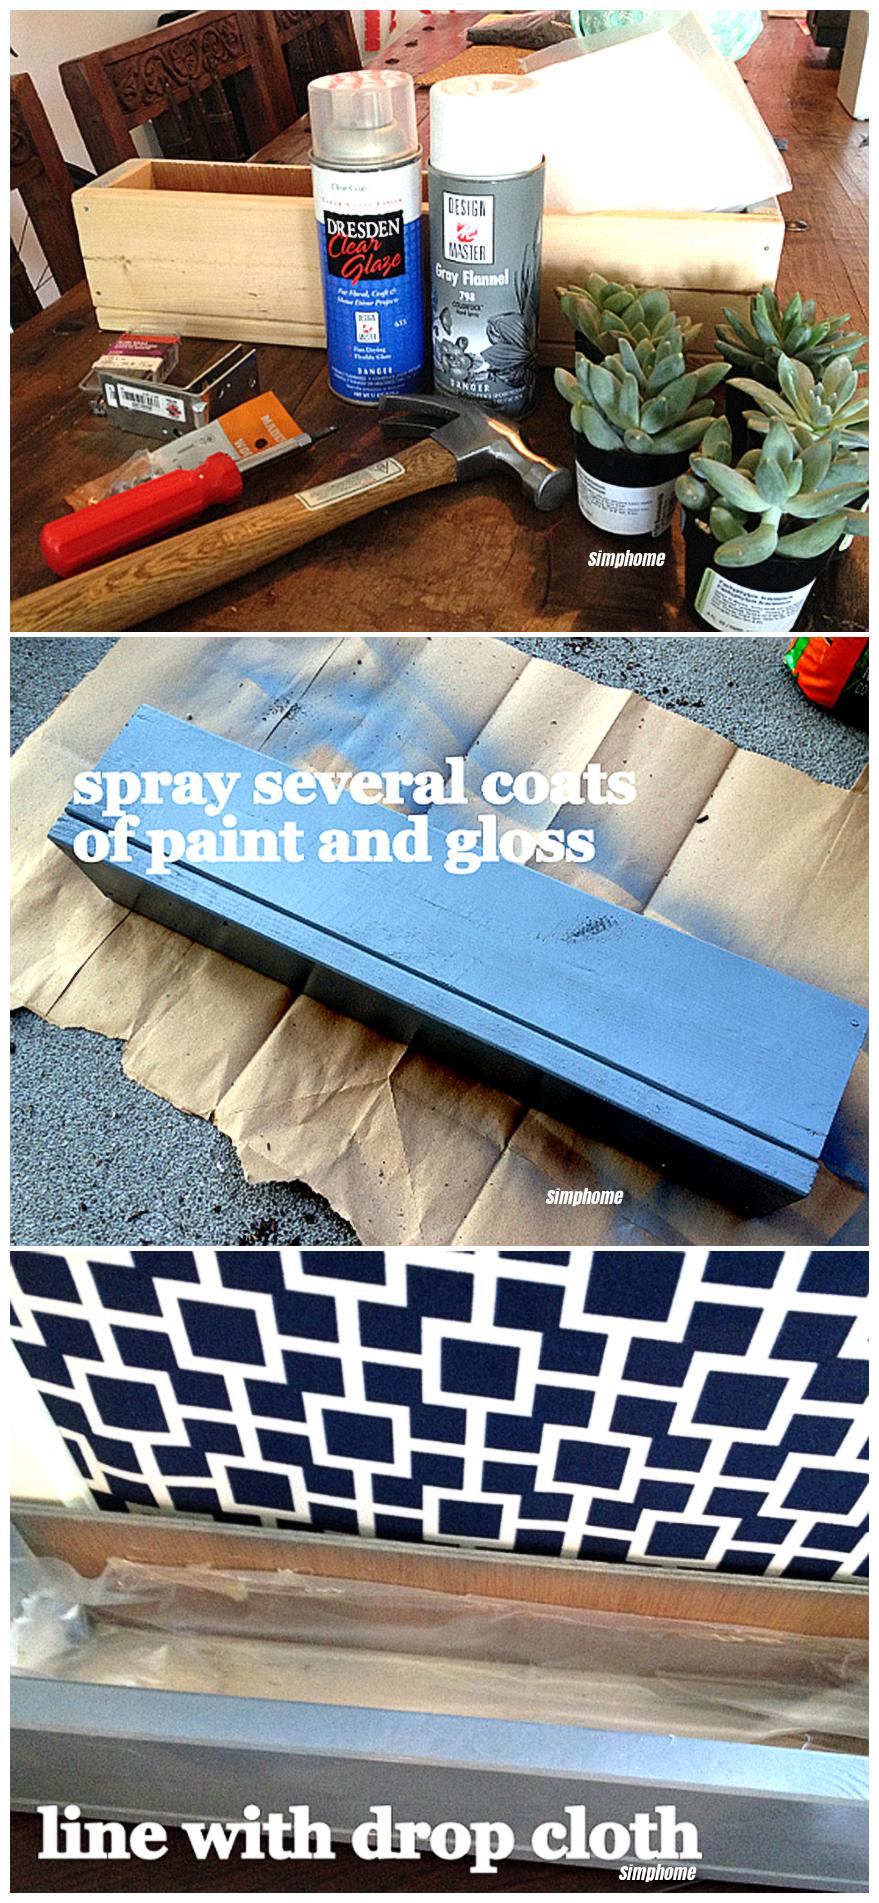 How to Build a DIY corkboard planter via simphome 6 7 8